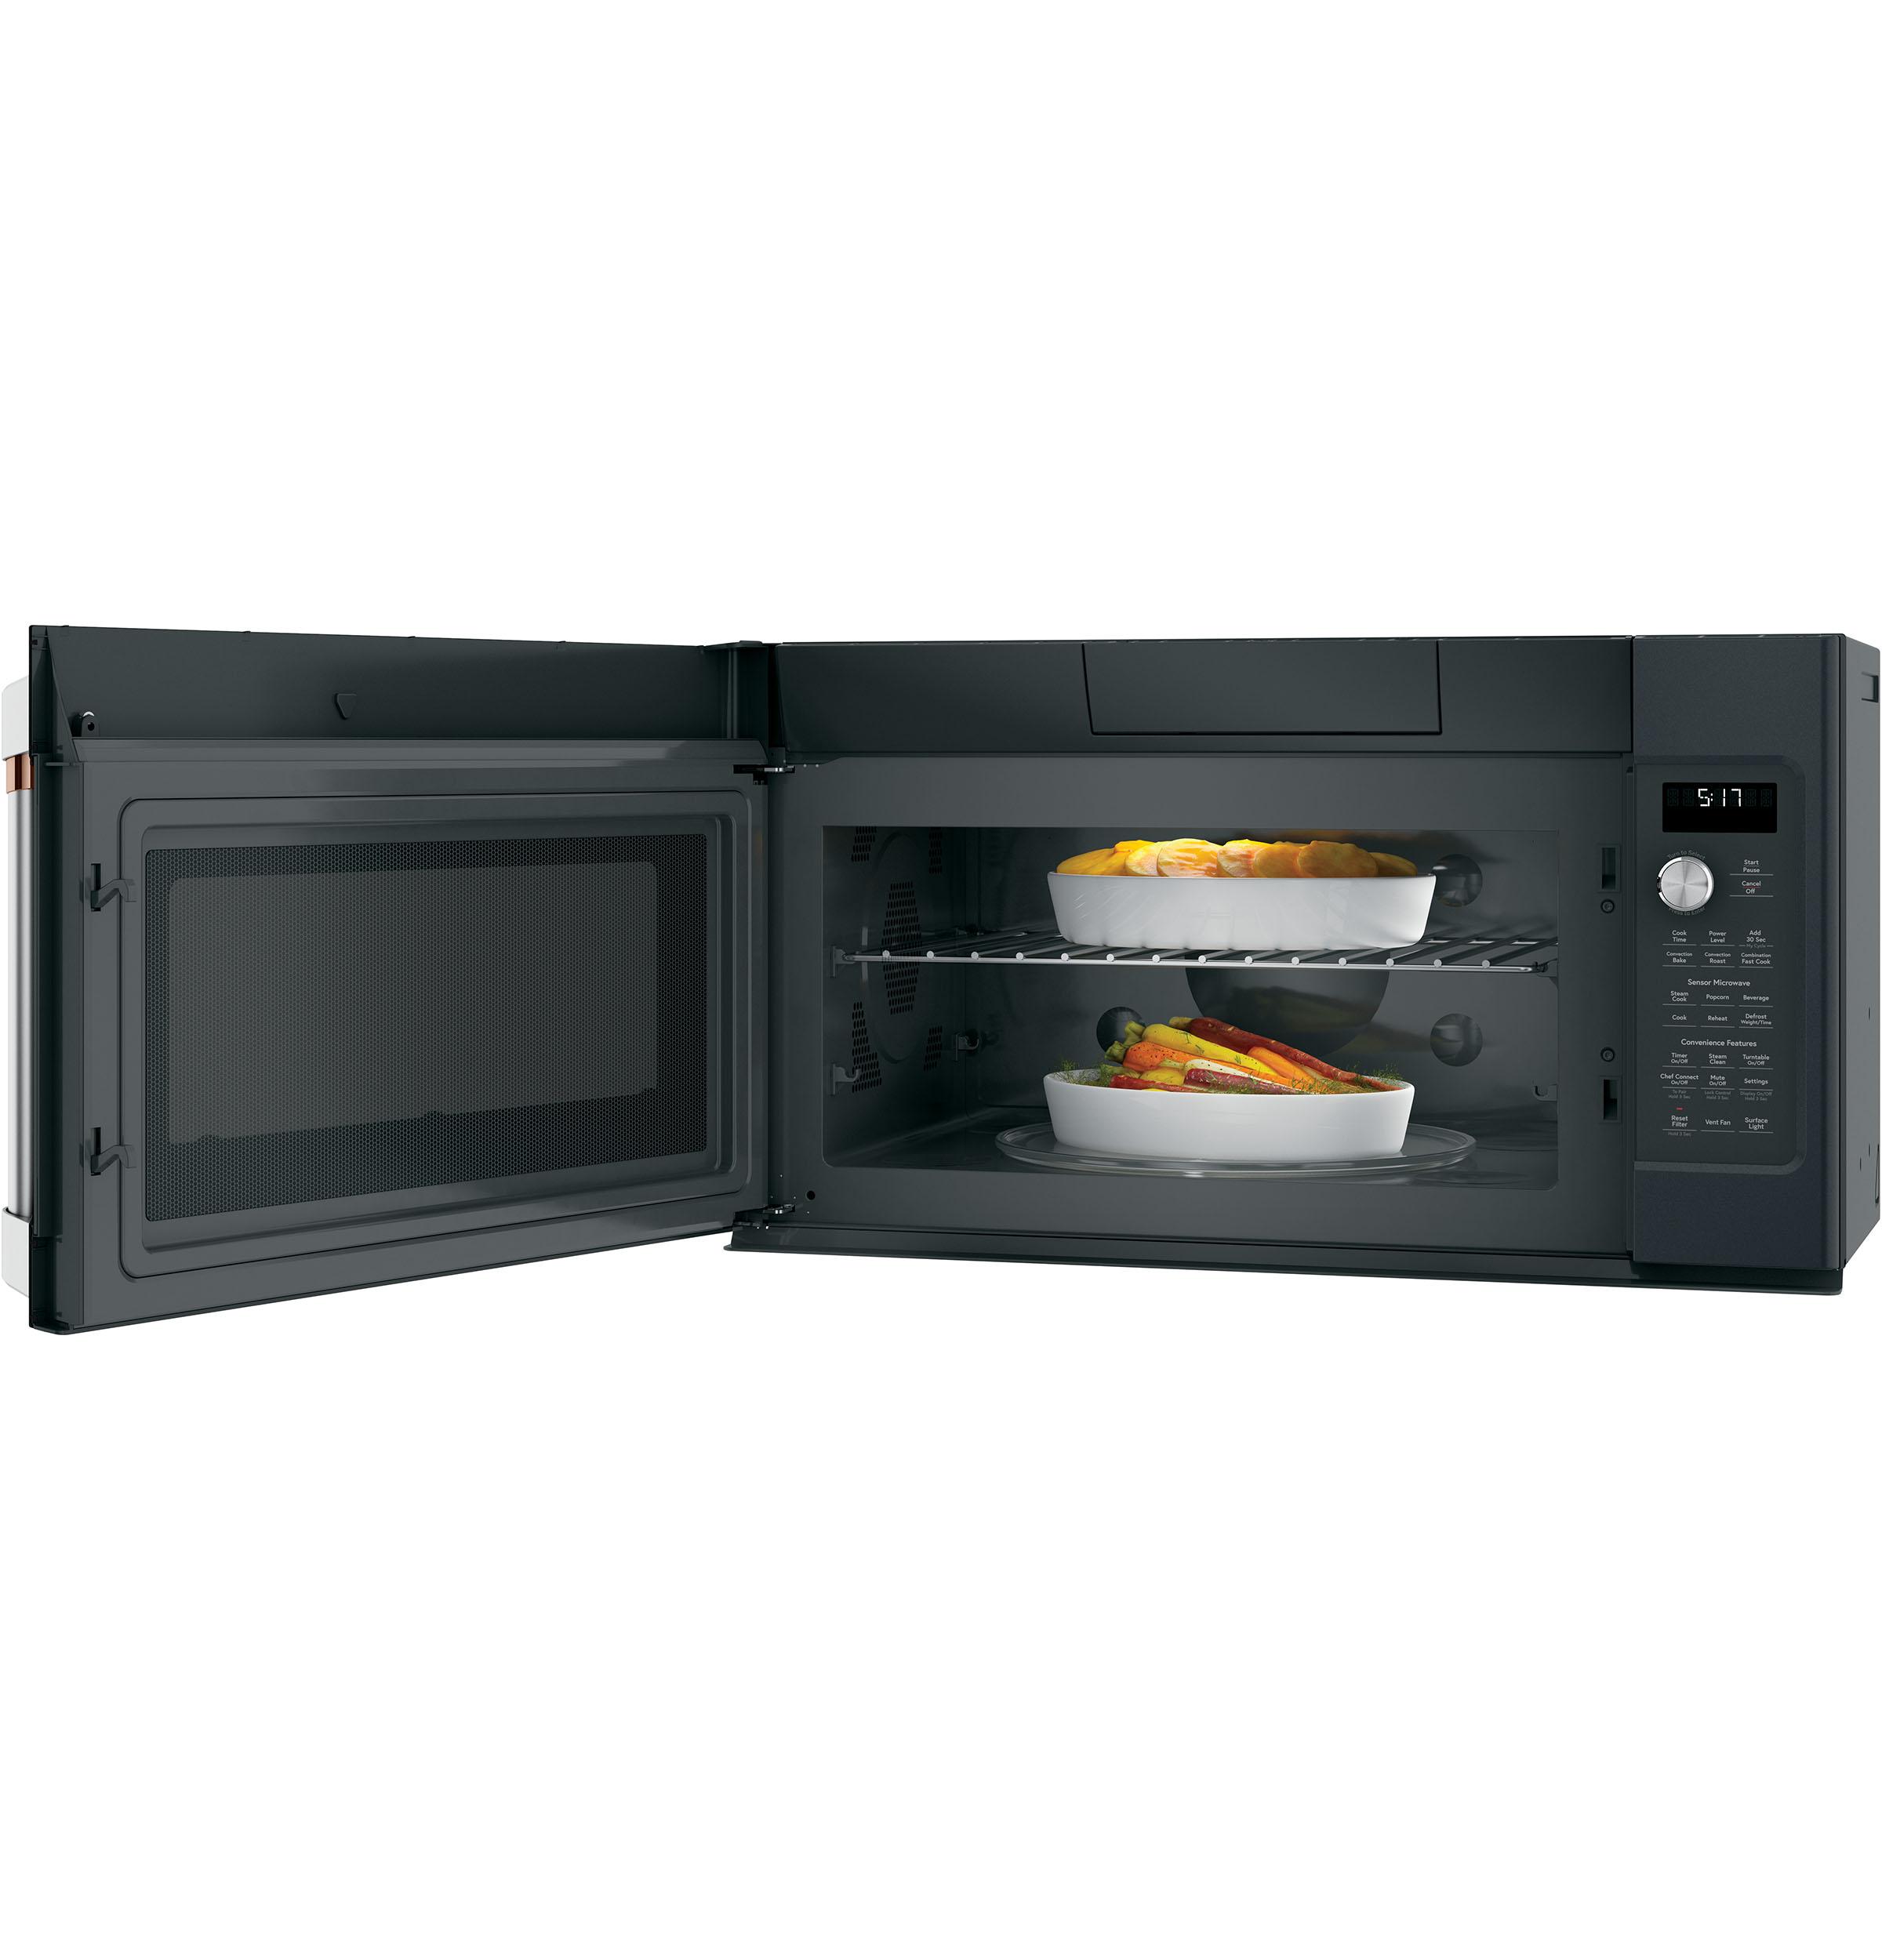 Café™ 1.7 Cu. Ft. Convection Over-the-Range Microwave Oven